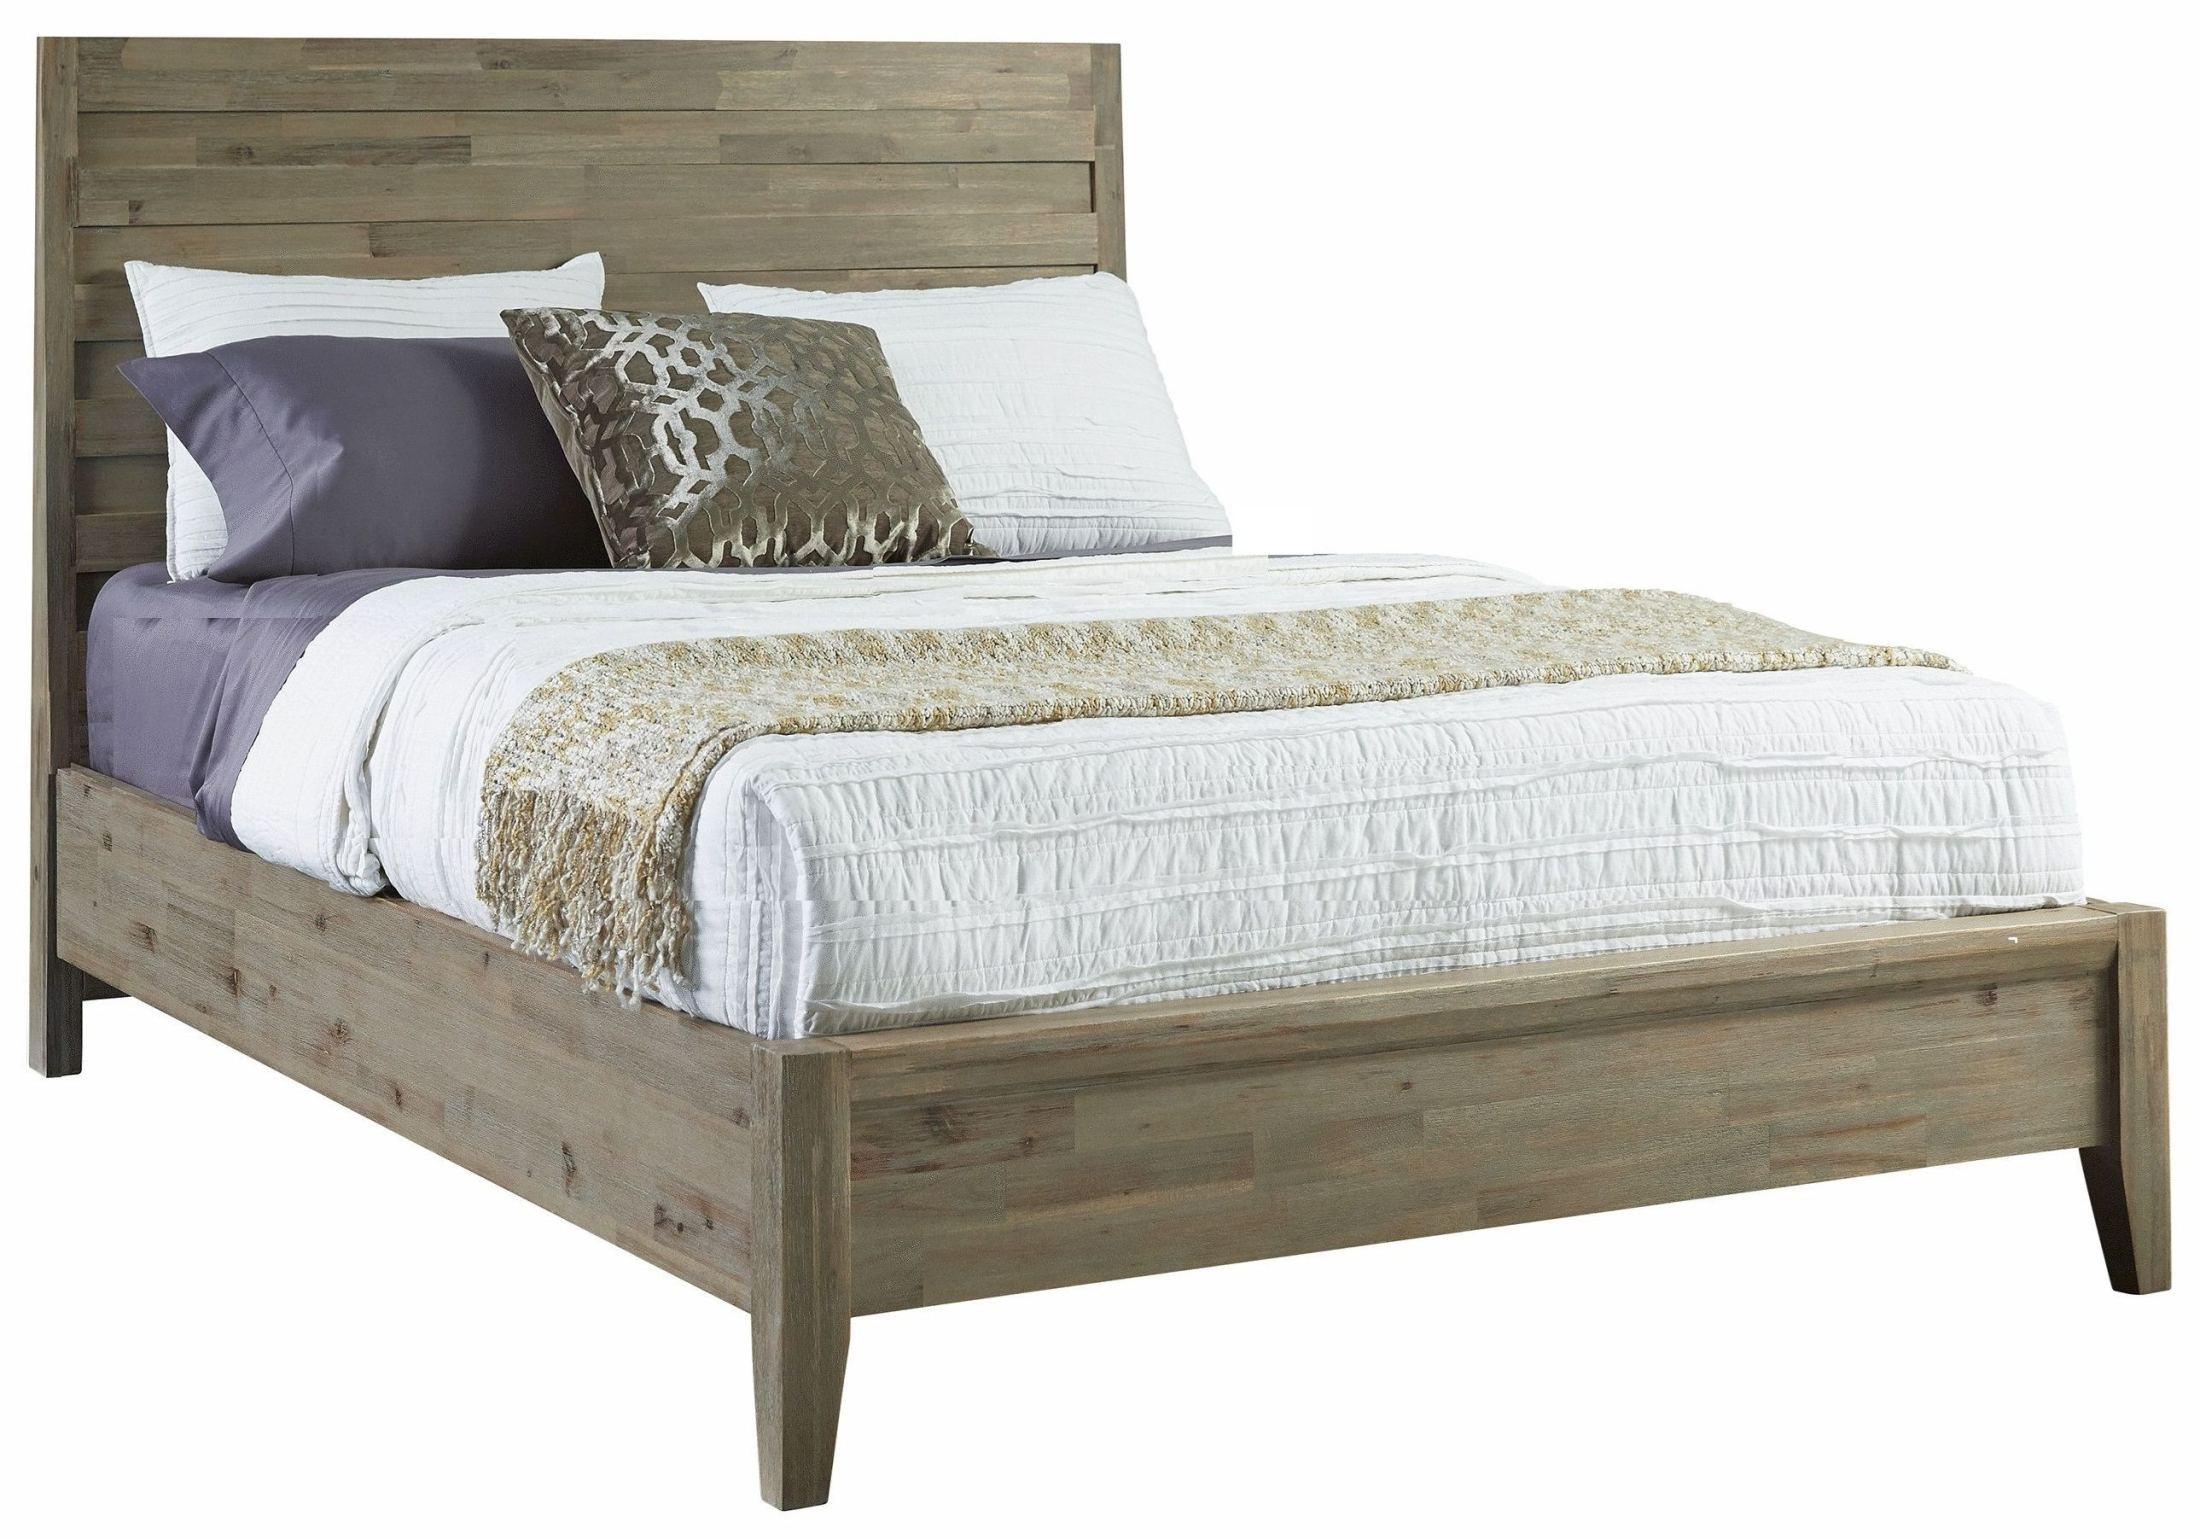 harbourside weathered wire brushed horizontal queen slat panel bed 372 920kq casana. Black Bedroom Furniture Sets. Home Design Ideas